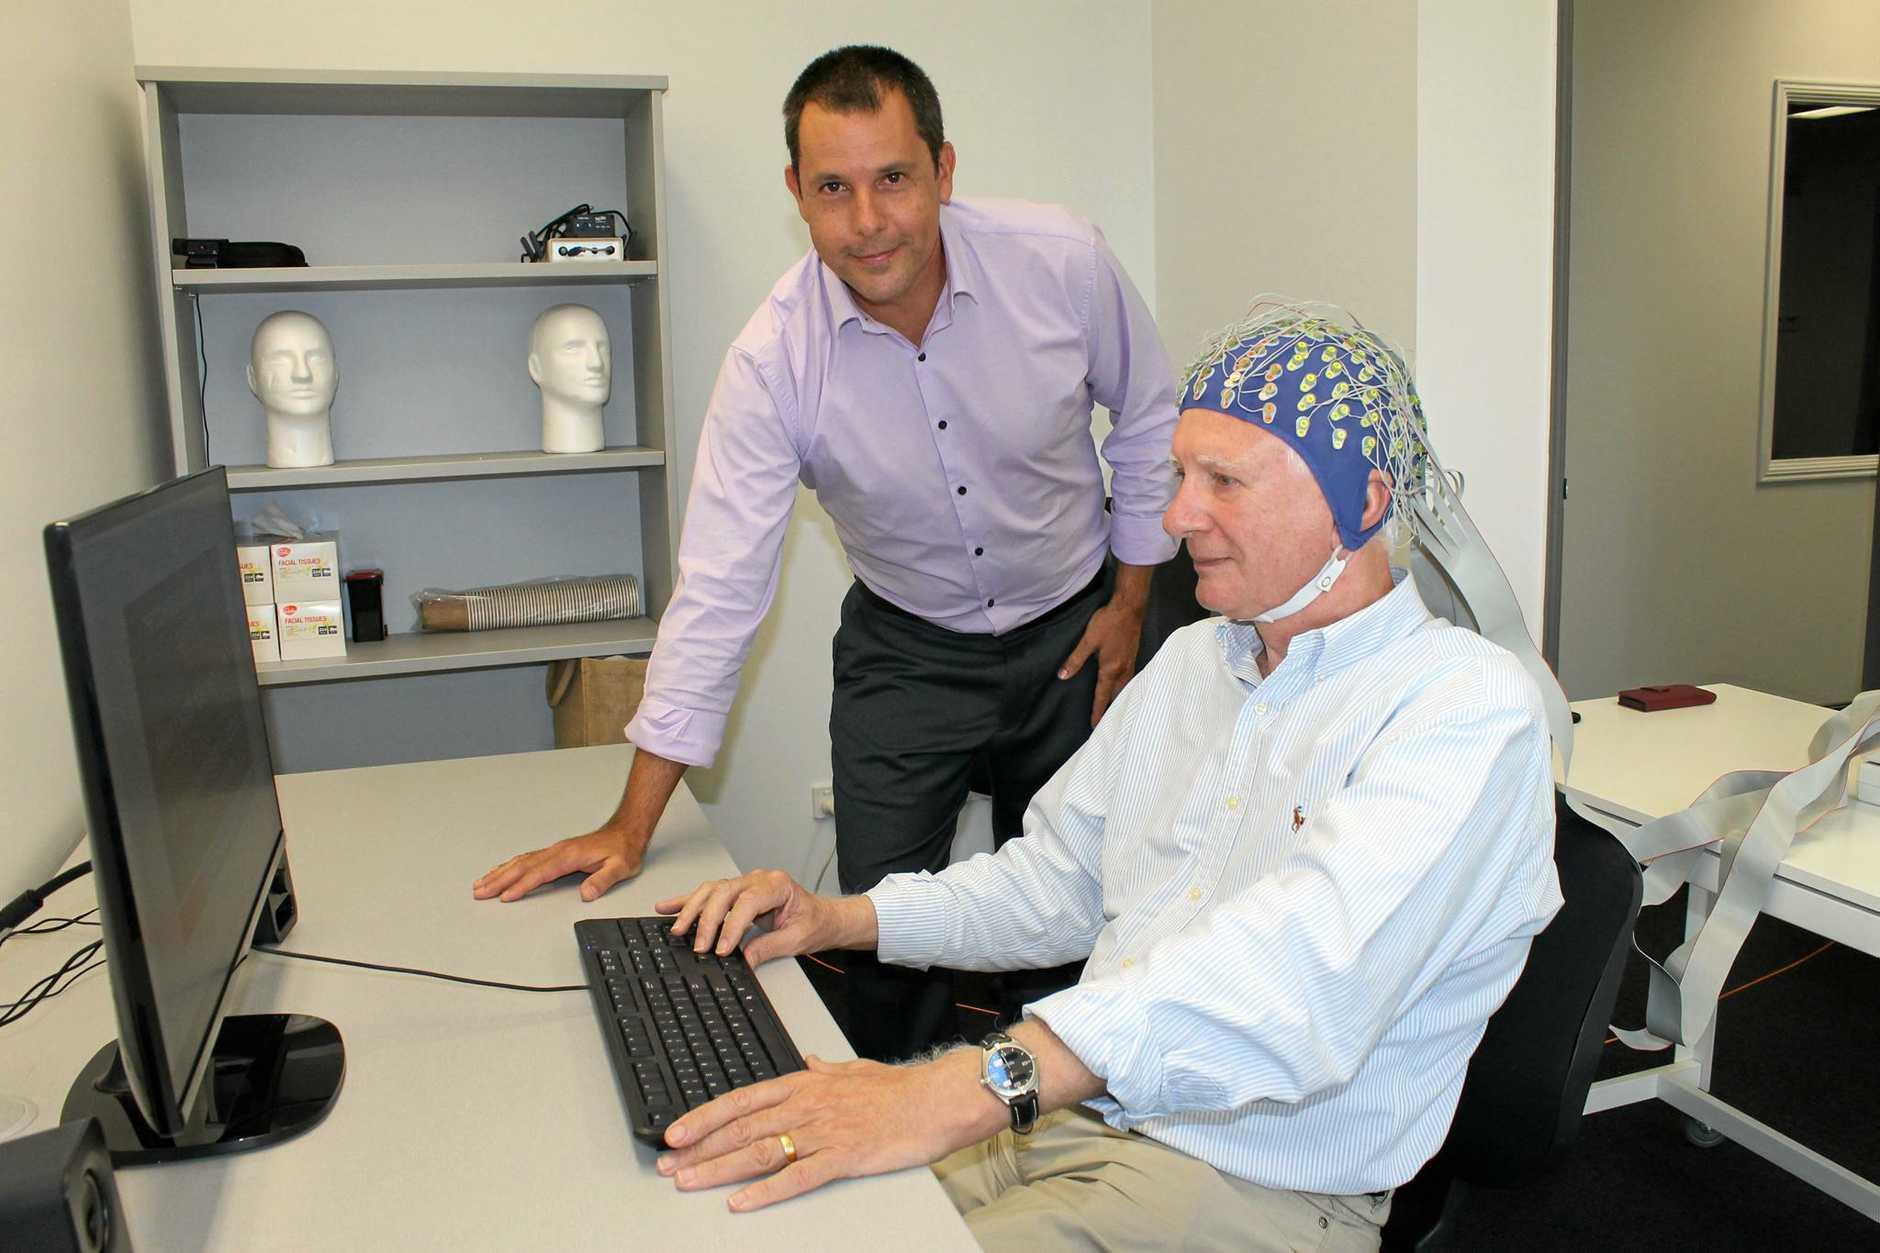 USC PhD student Ben Isbel showing a volunteer the neuroscience equipment at the Sunshine Coast Mind & Neuroscience - Thompson Institute.